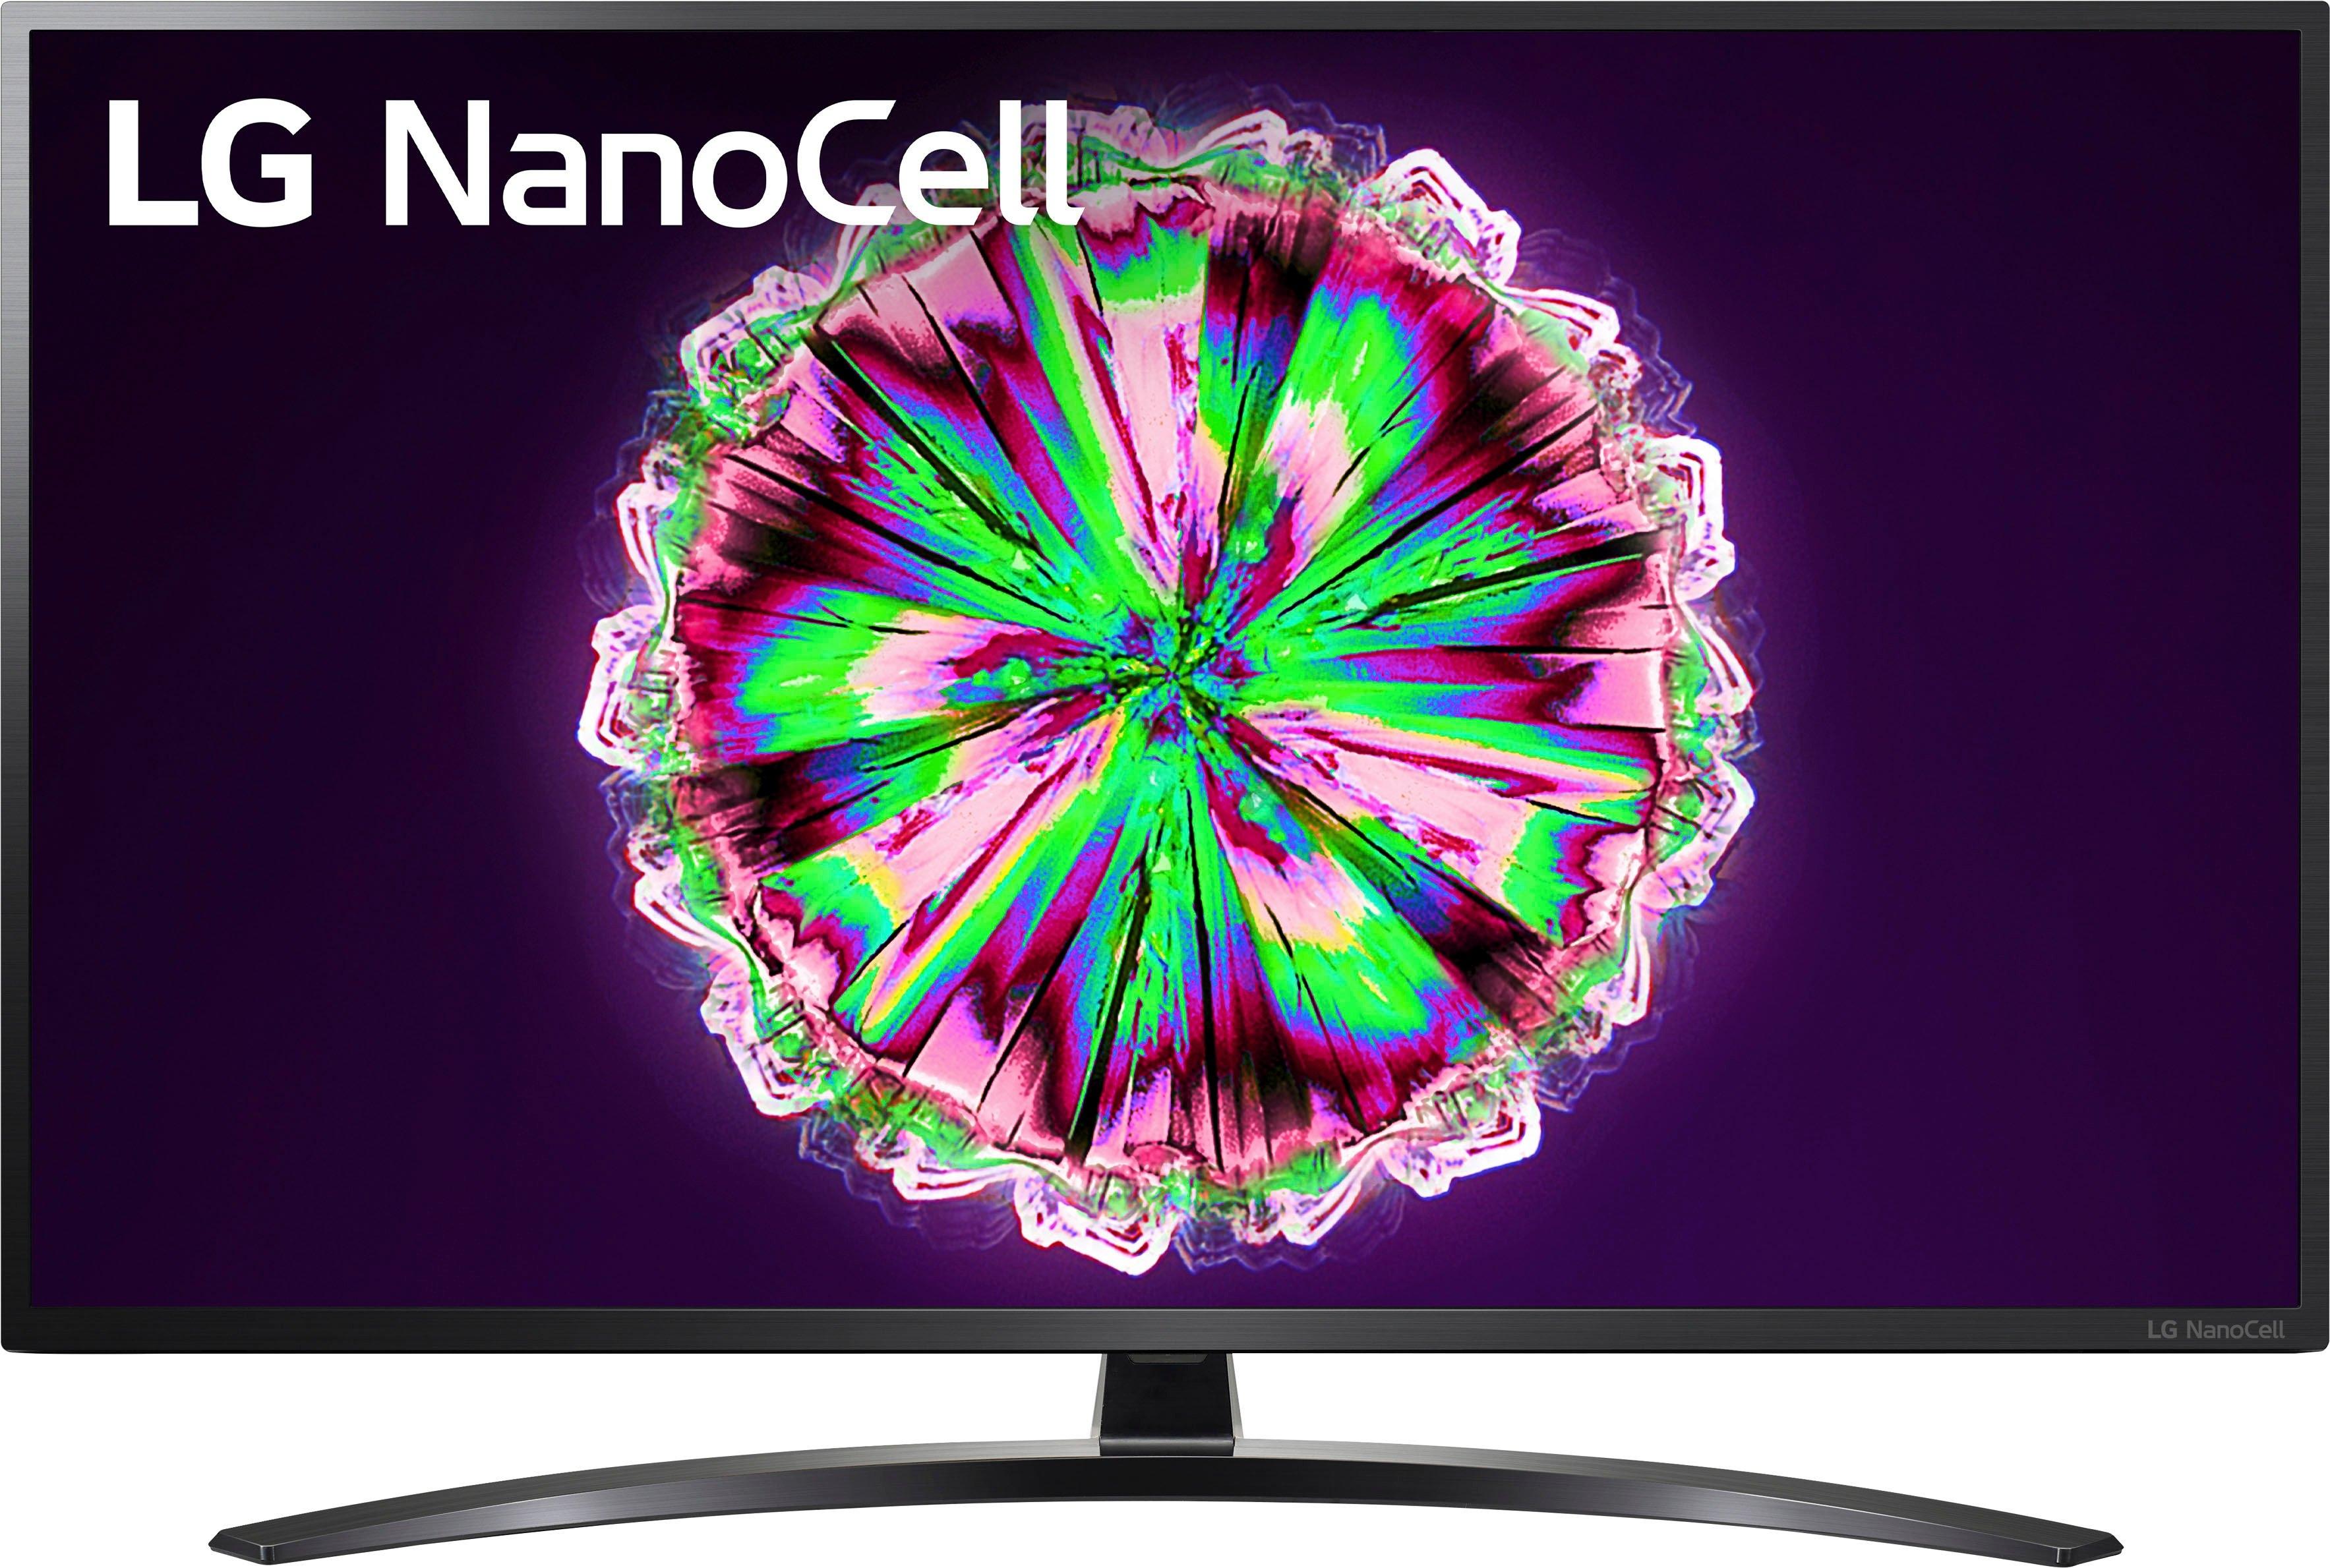 LG »55NANO796NE« LED-TV bestellen: 30 dagen bedenktijd